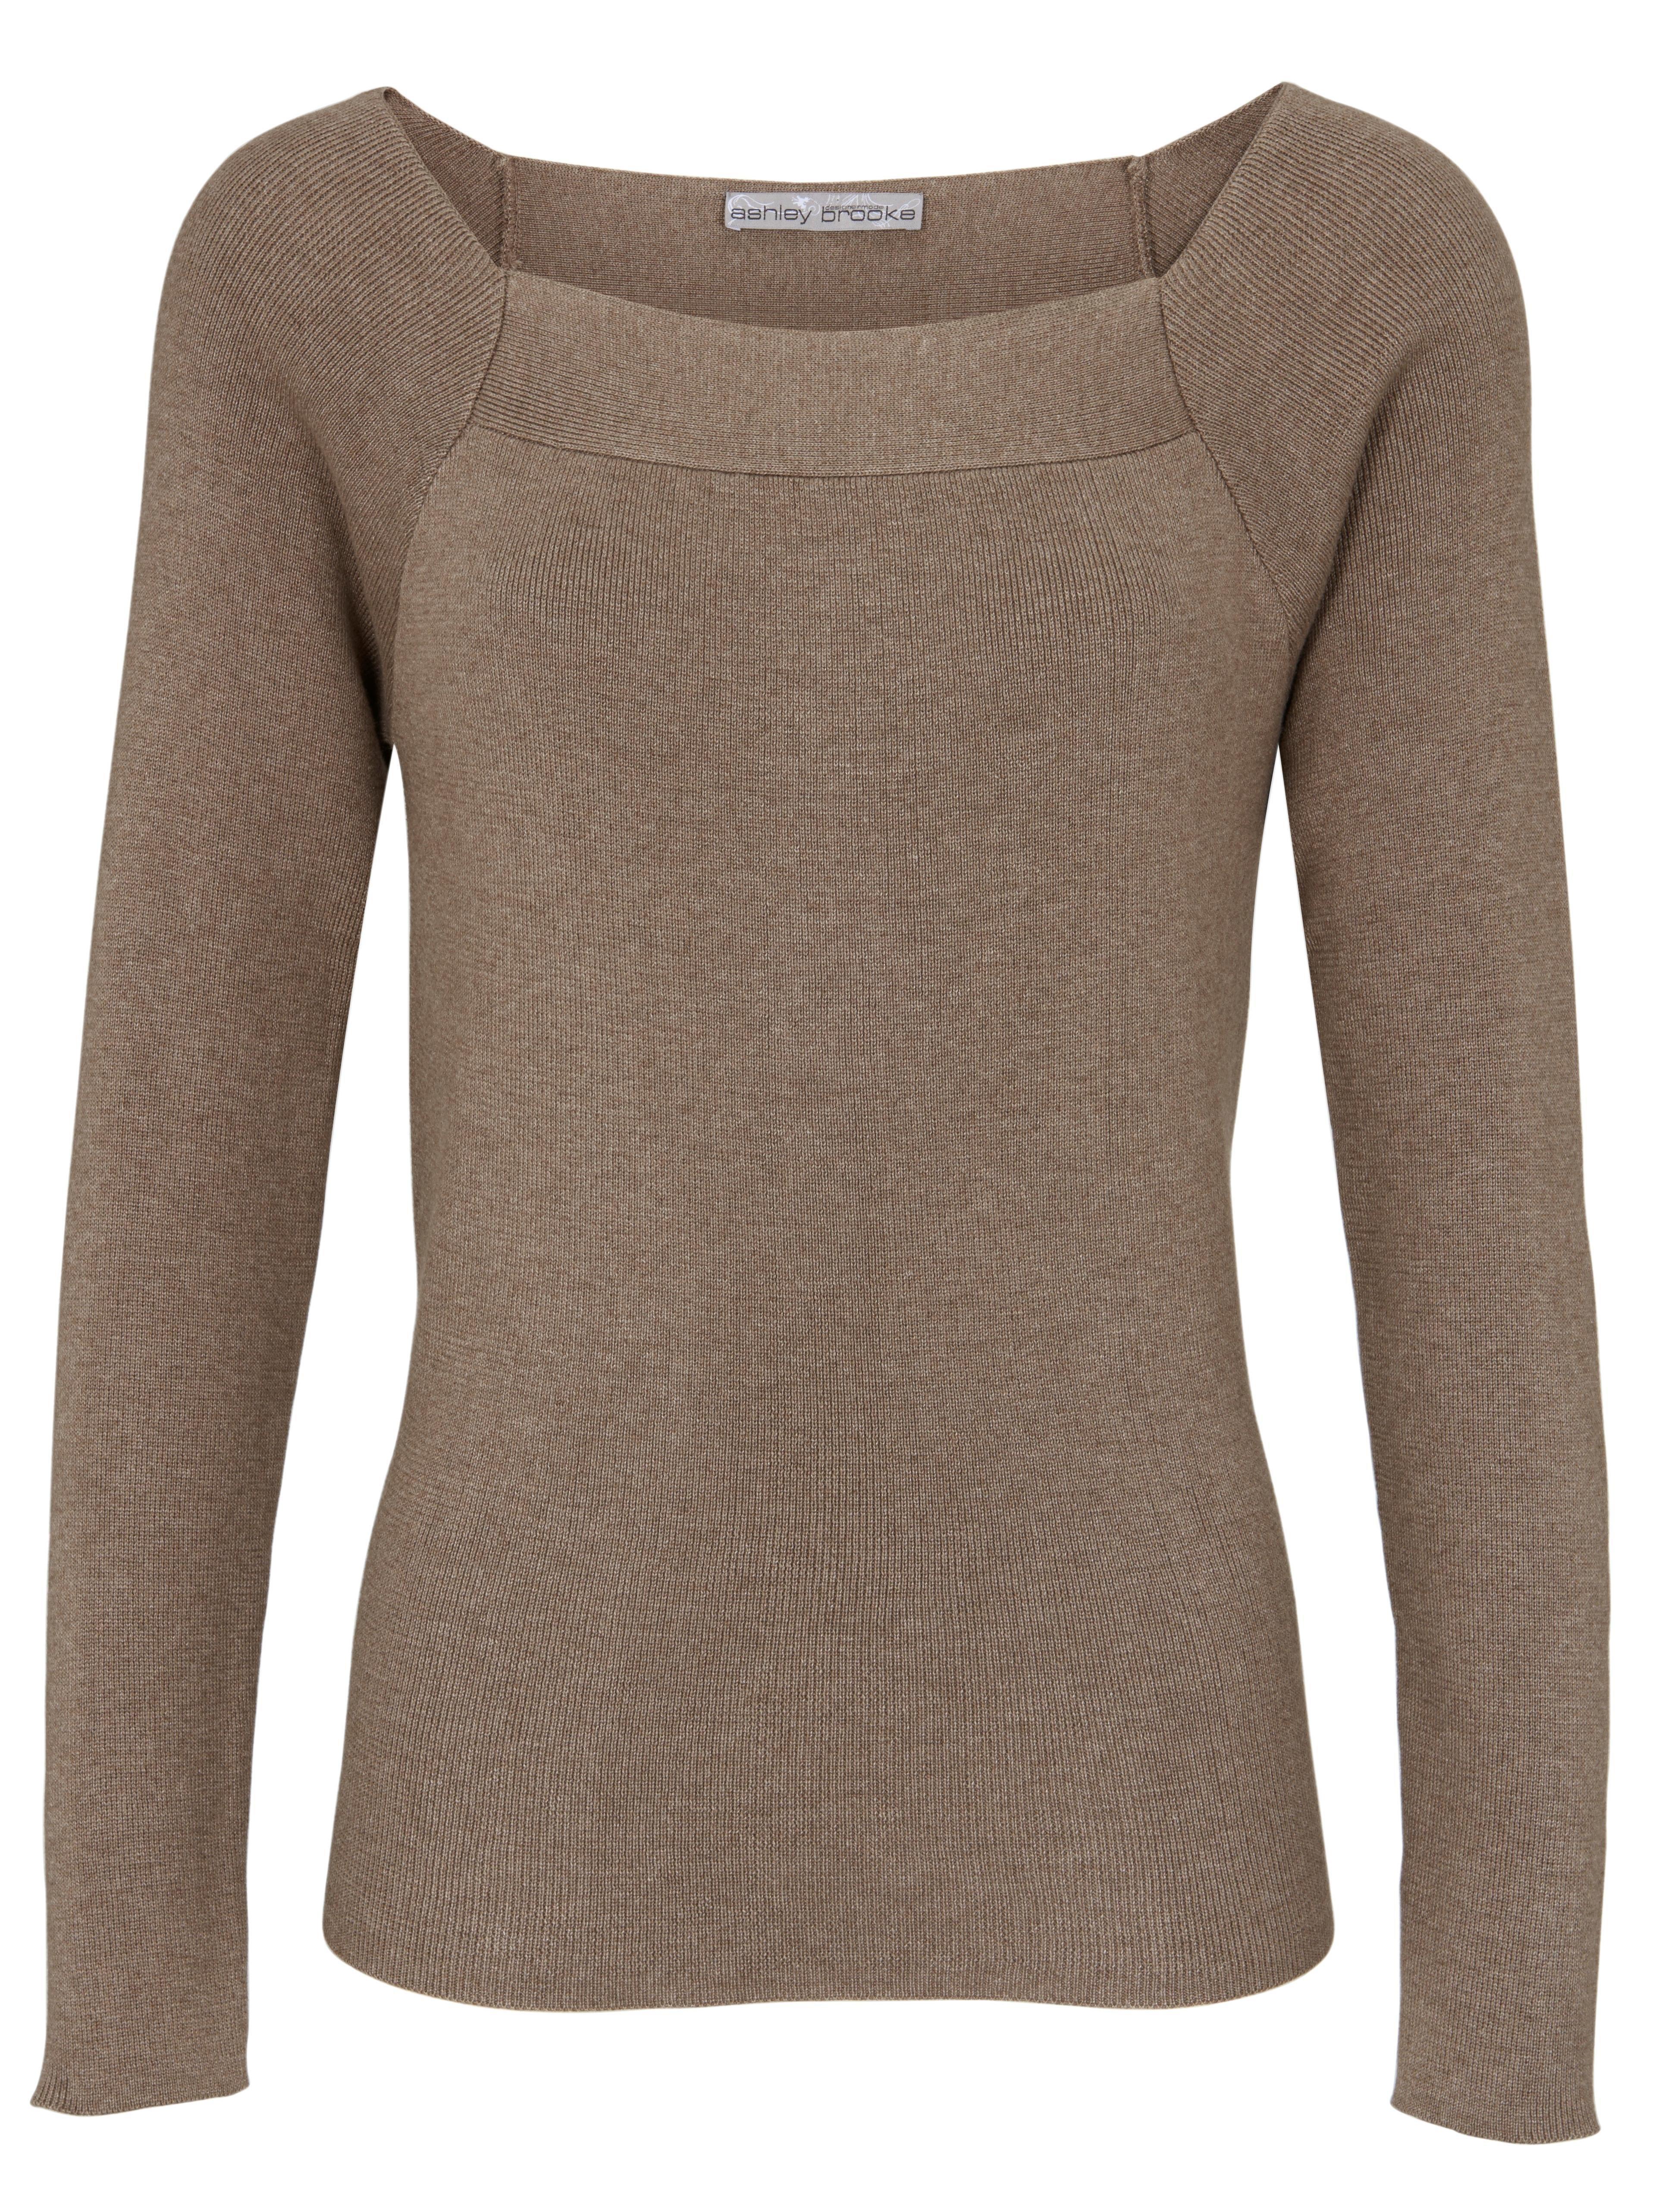 Ashley Brooke By Heine Fijngebreide trui nu online bestellen